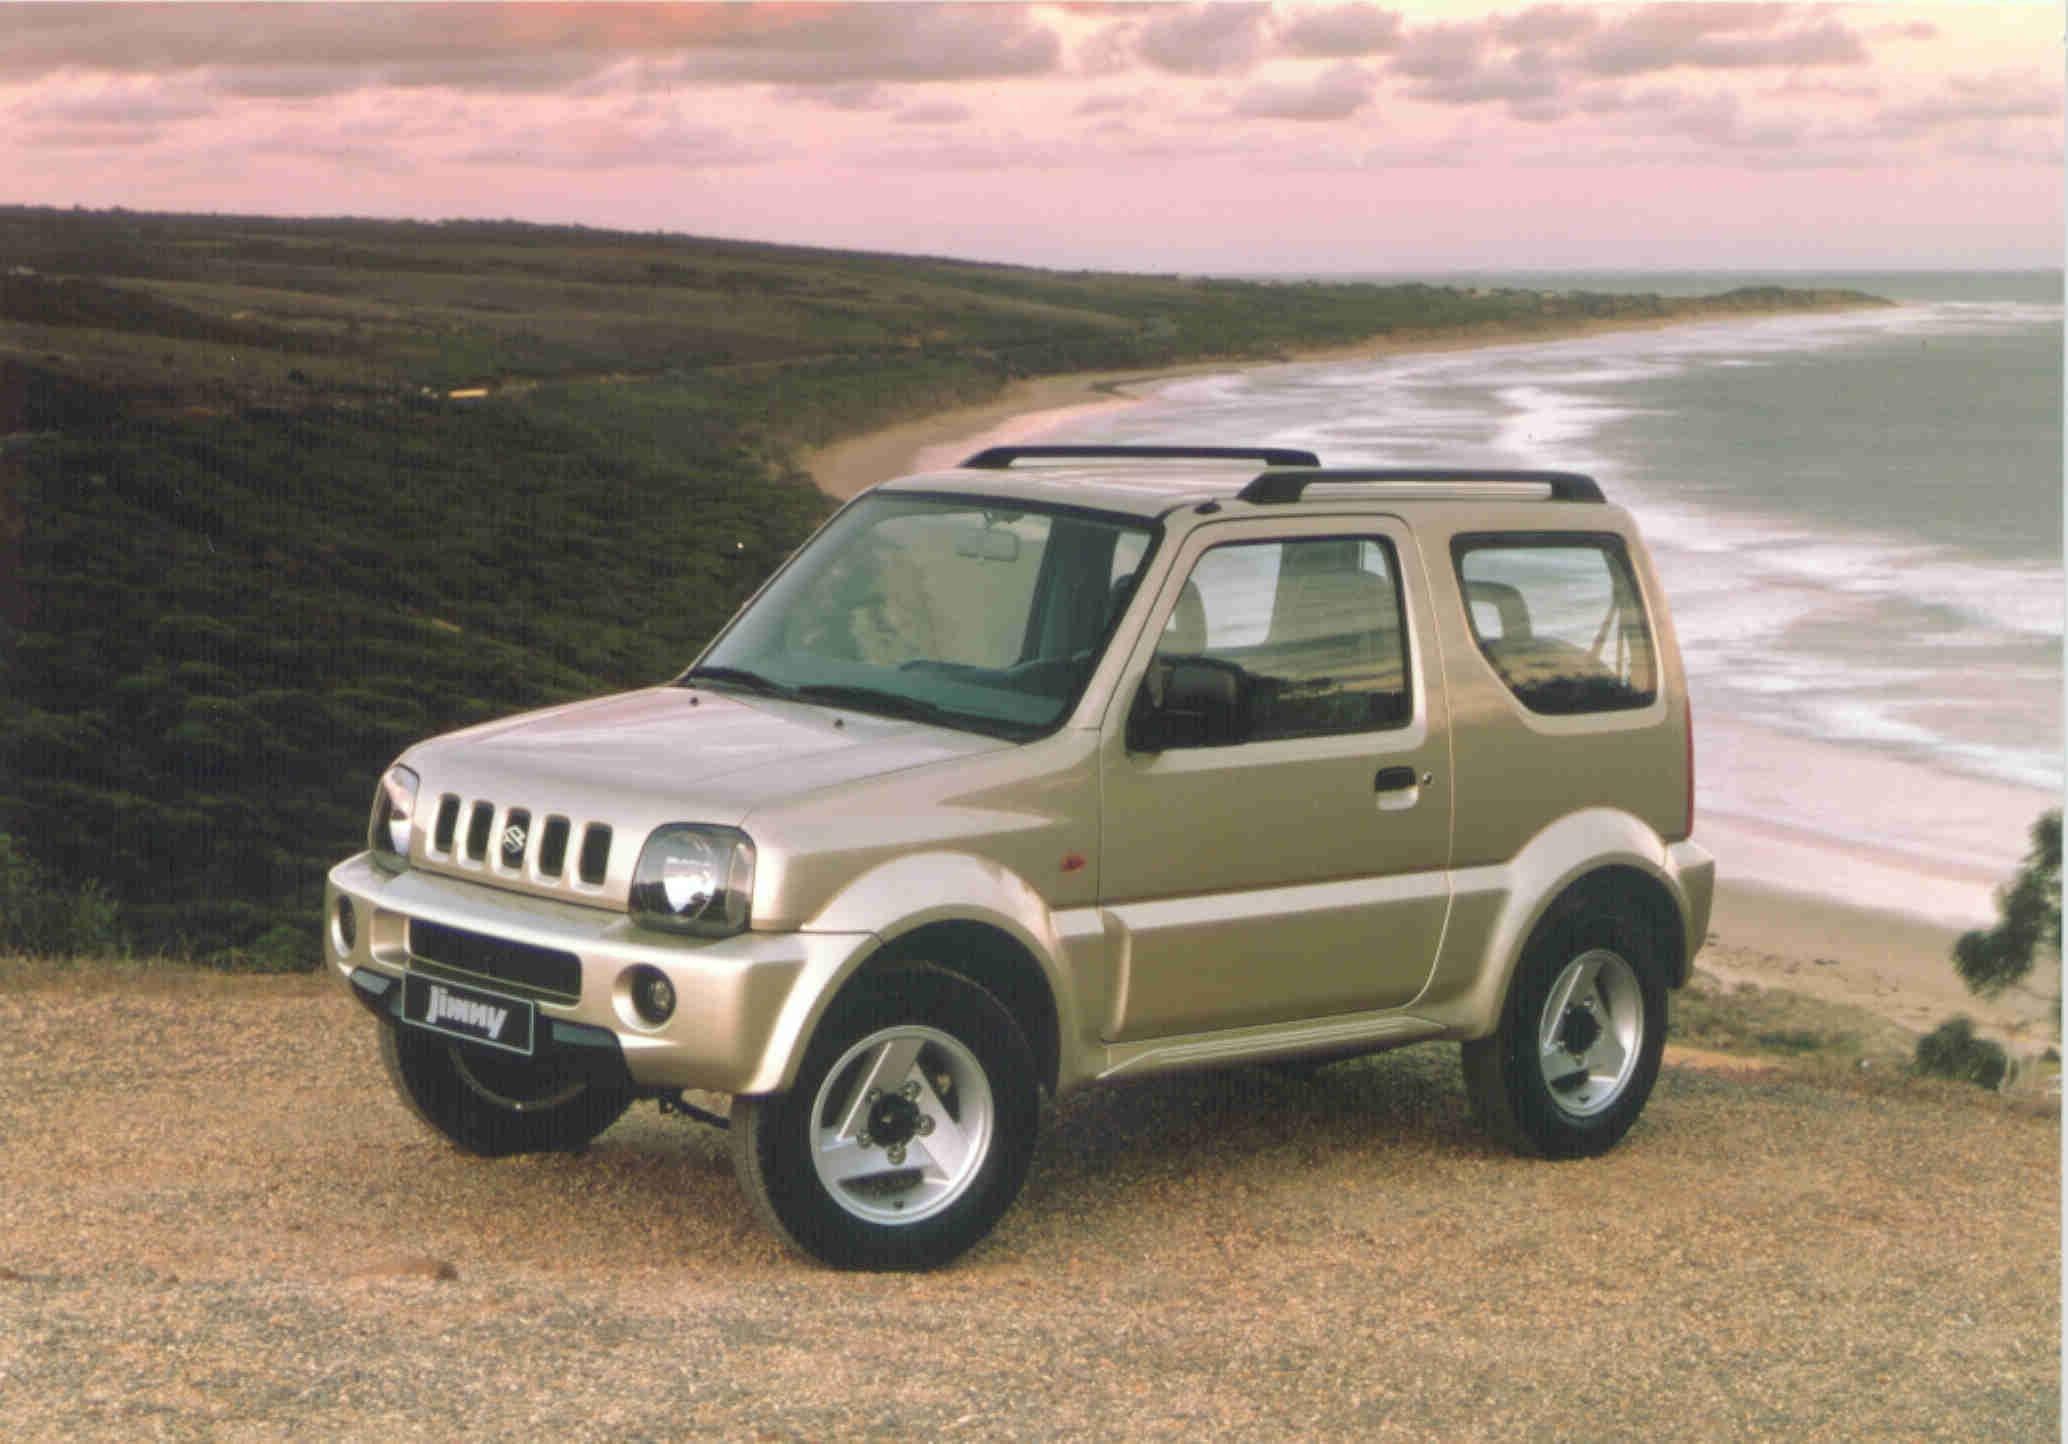 Suzuki Australia is set to offer the new version of its little Jimny SUV.